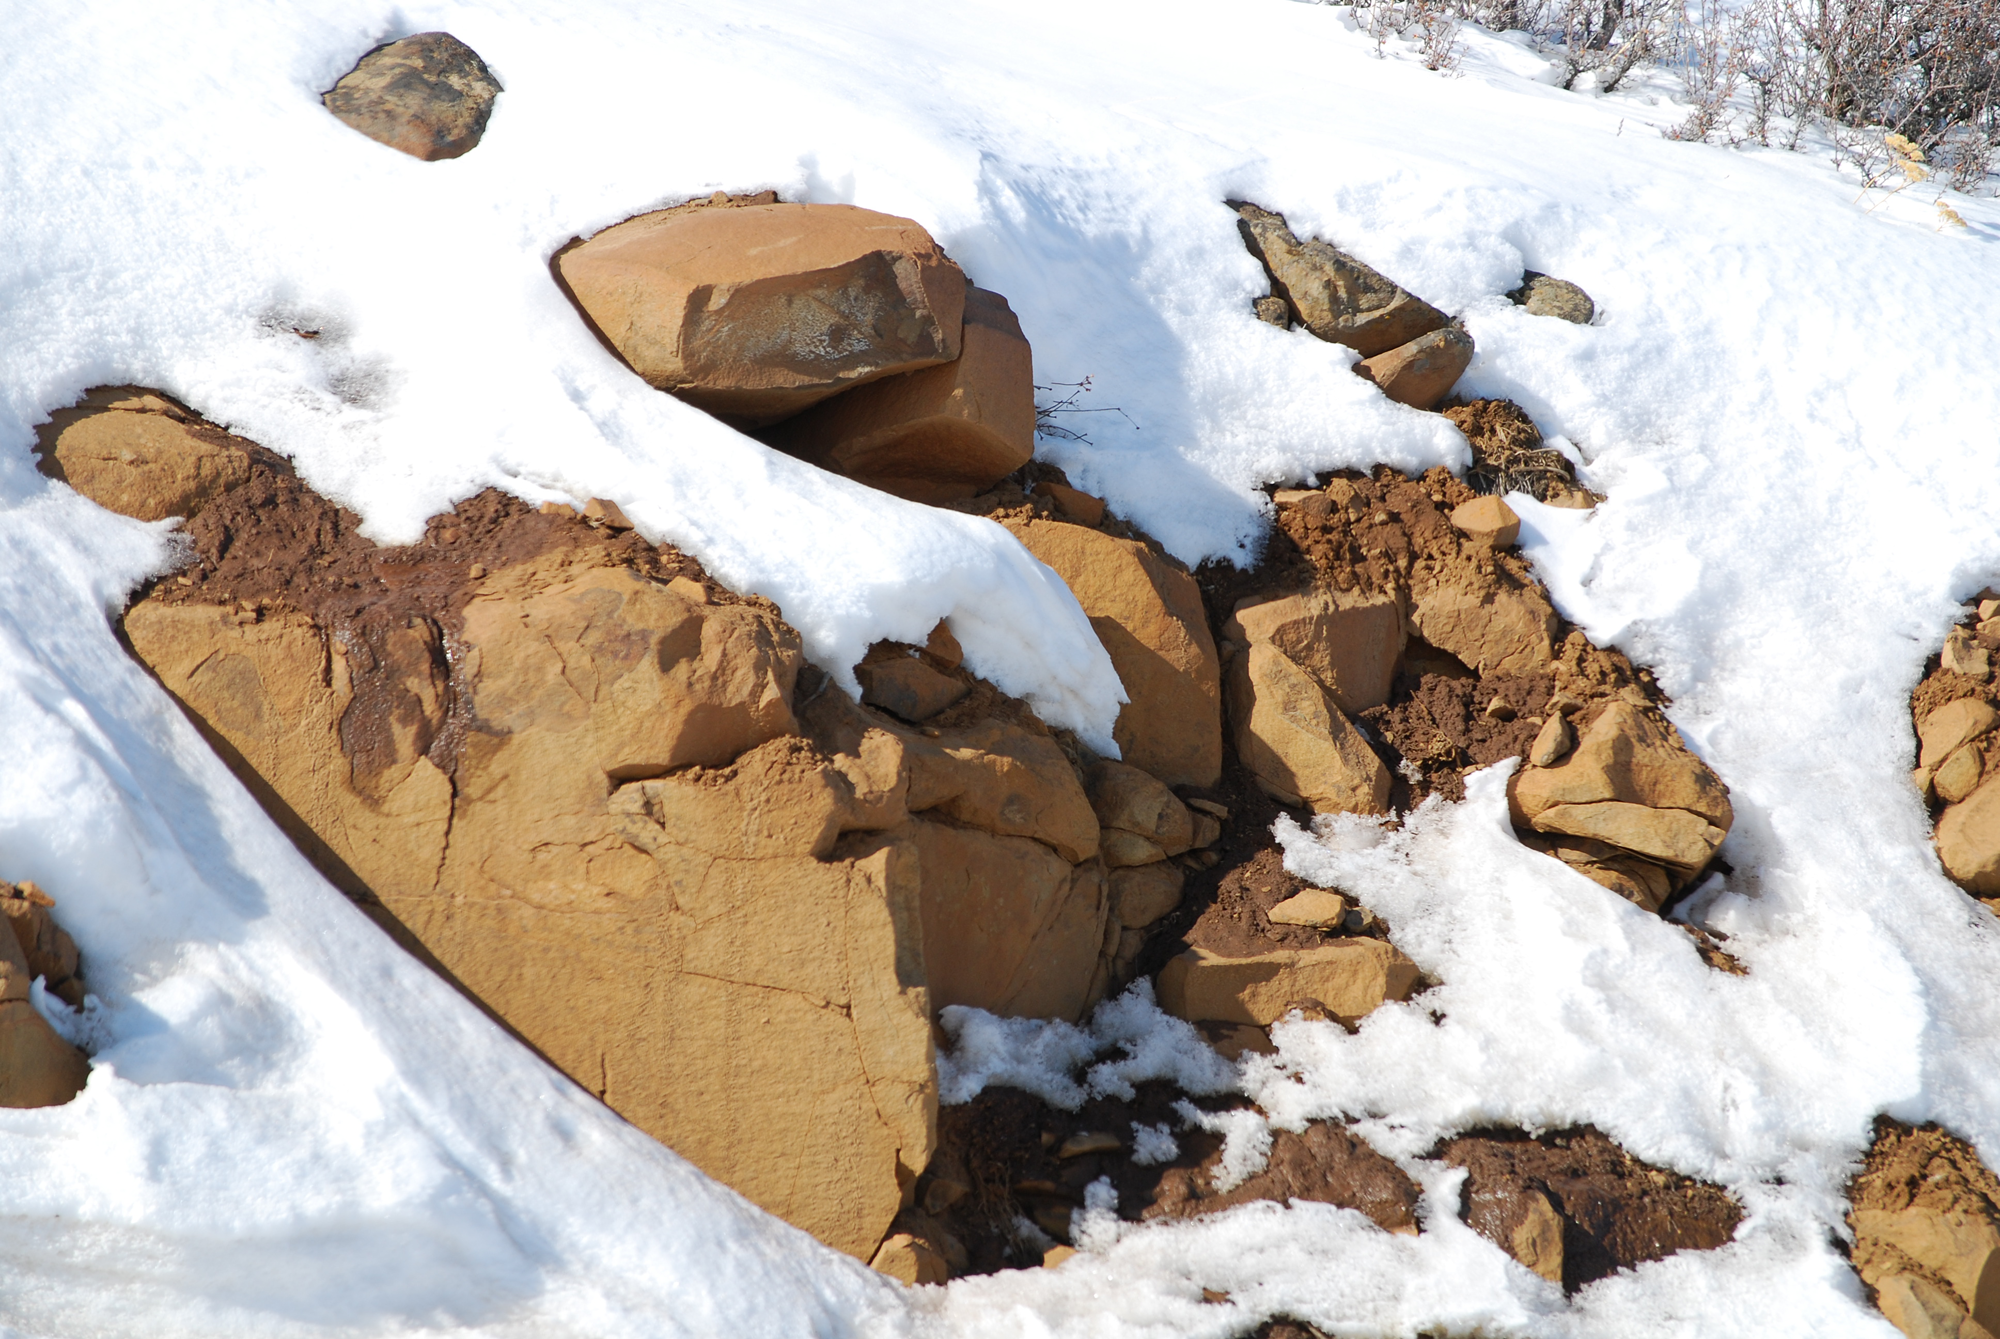 Winter Rock 8 by Garsha-Stock